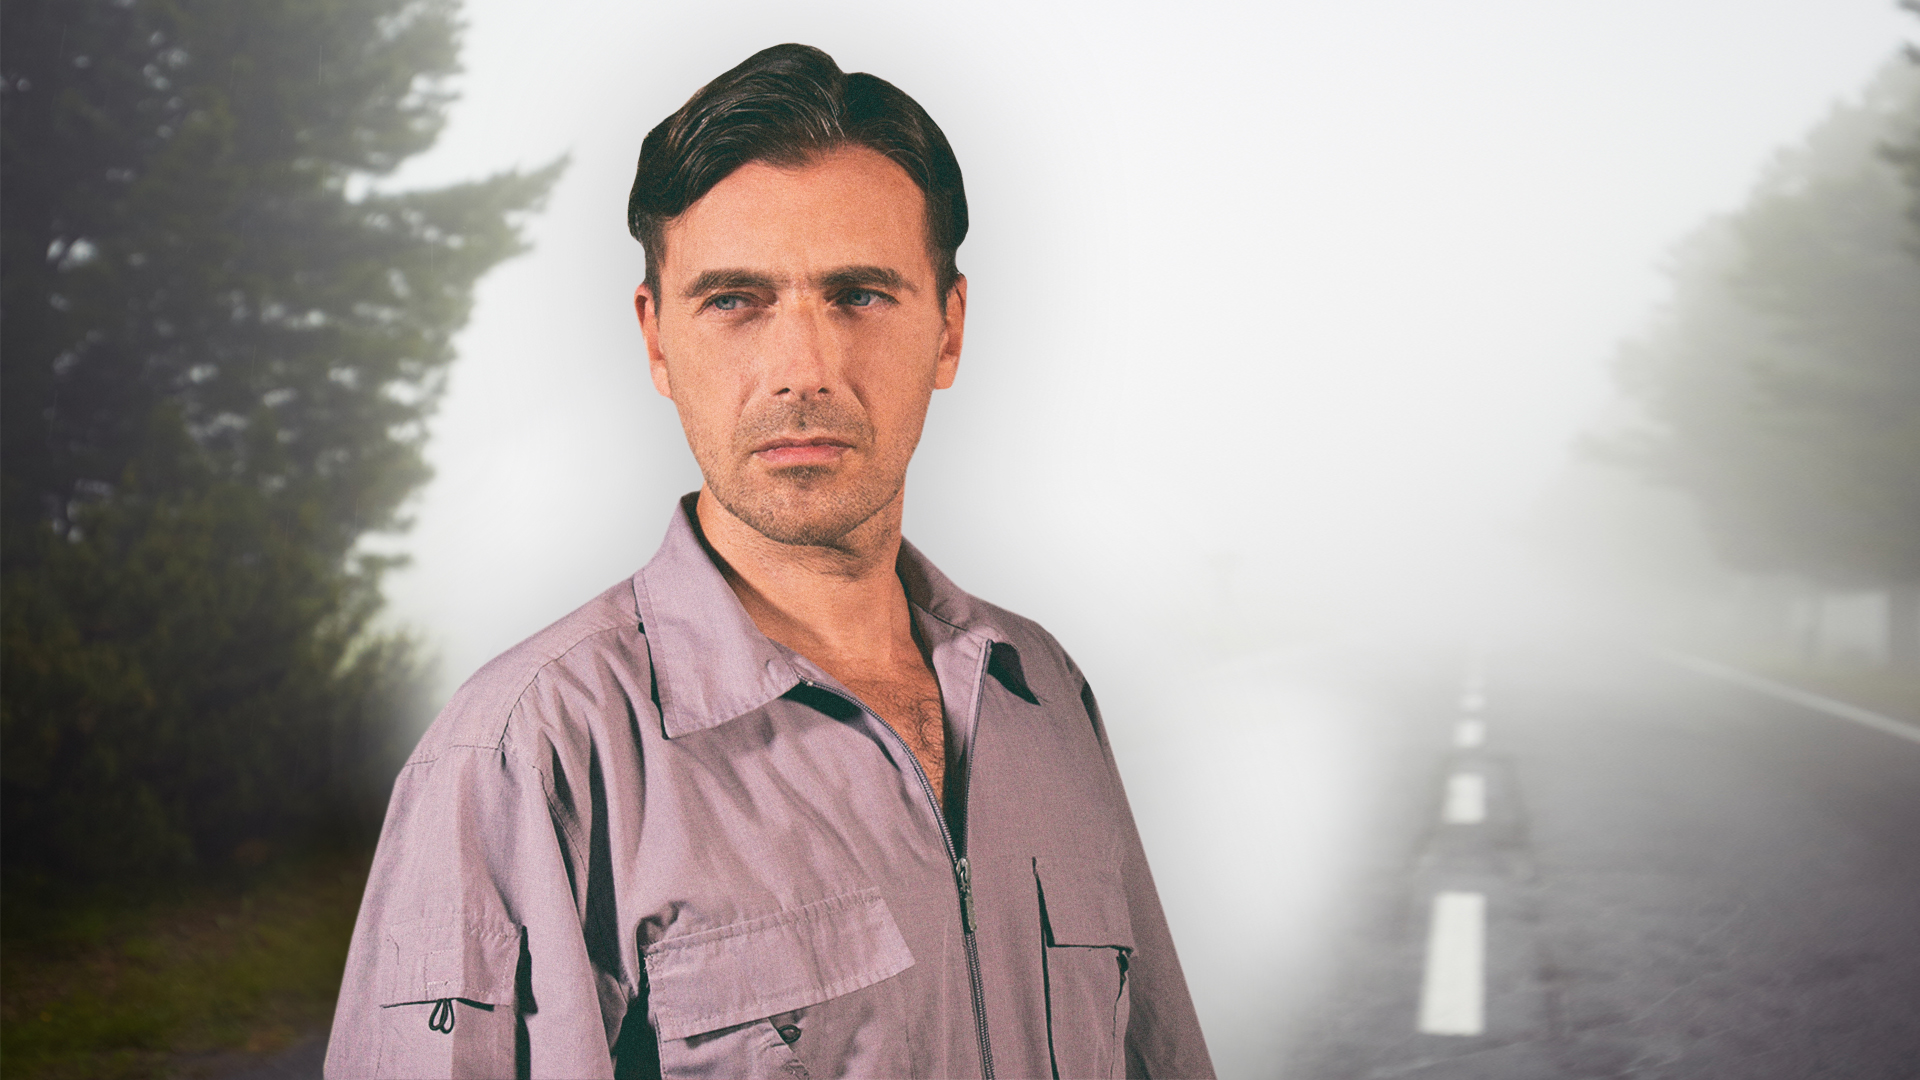 Yiannis Apostolides - Actor